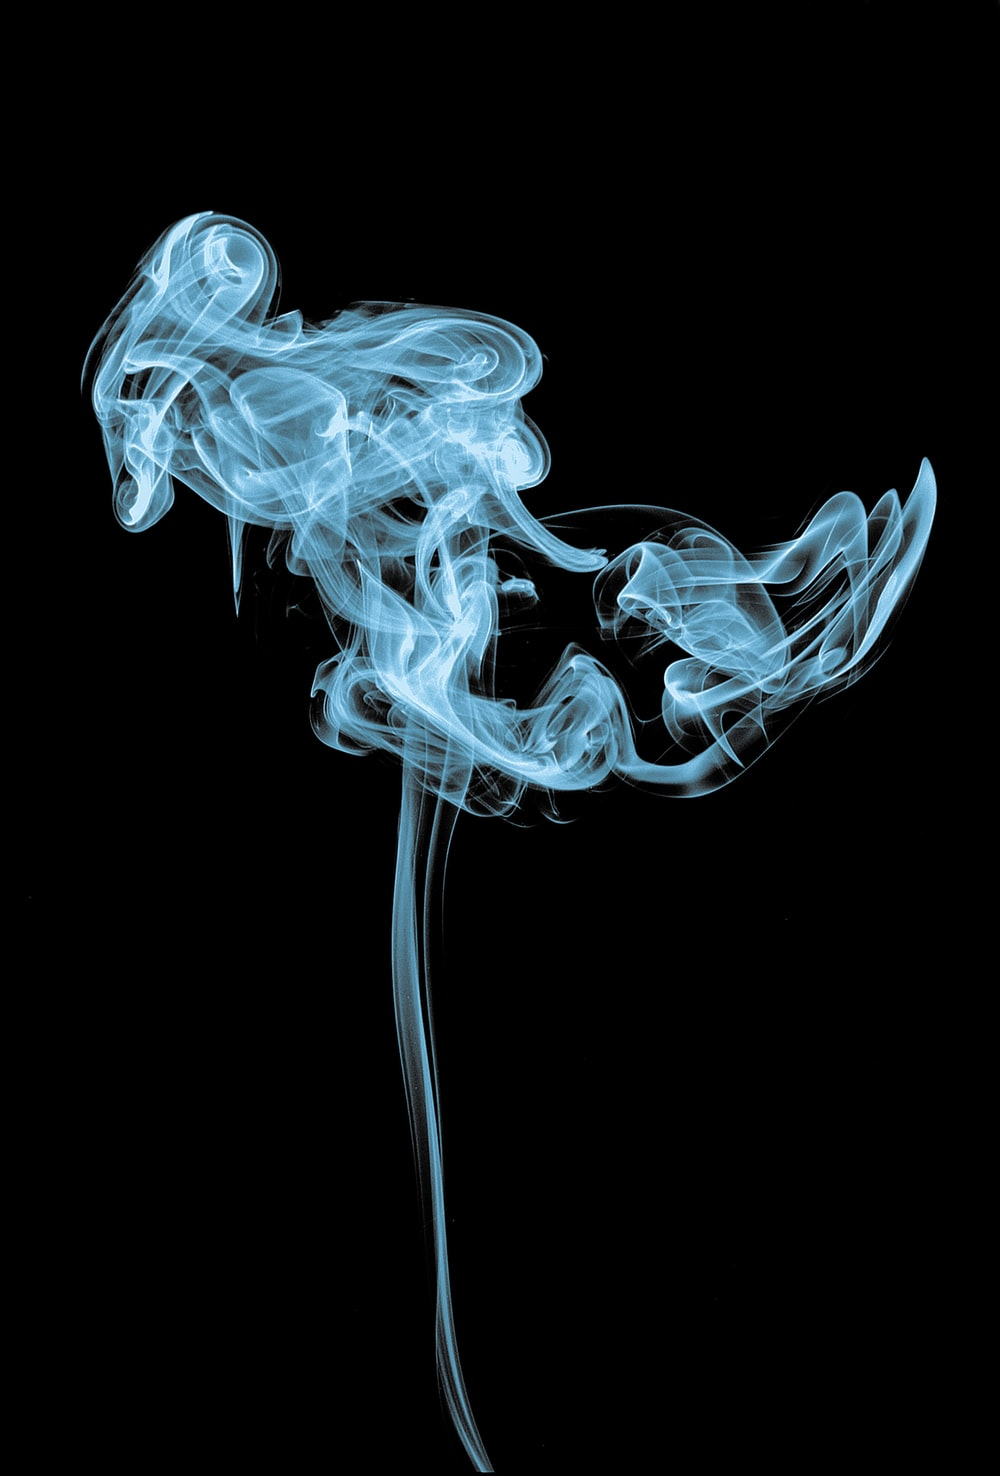 white smoke inside the dark room